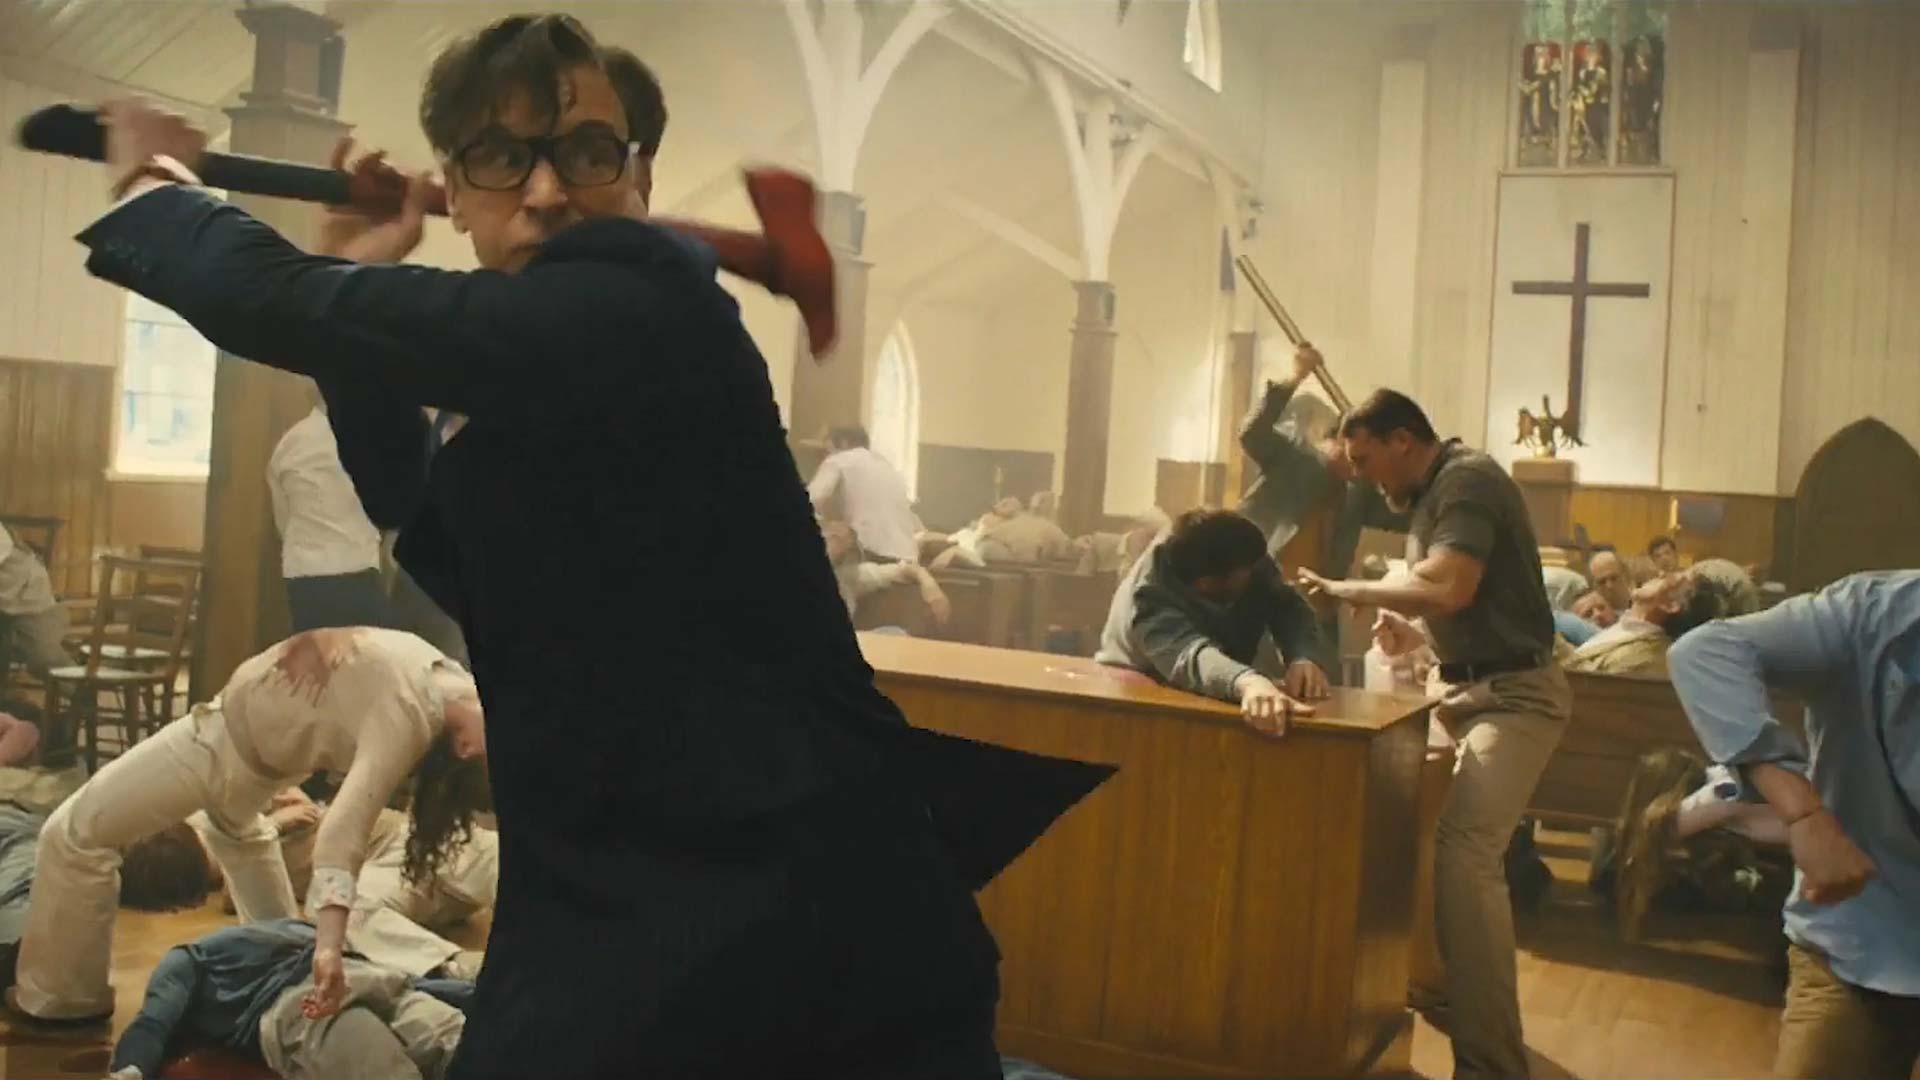 kingsman-church-fight-scene